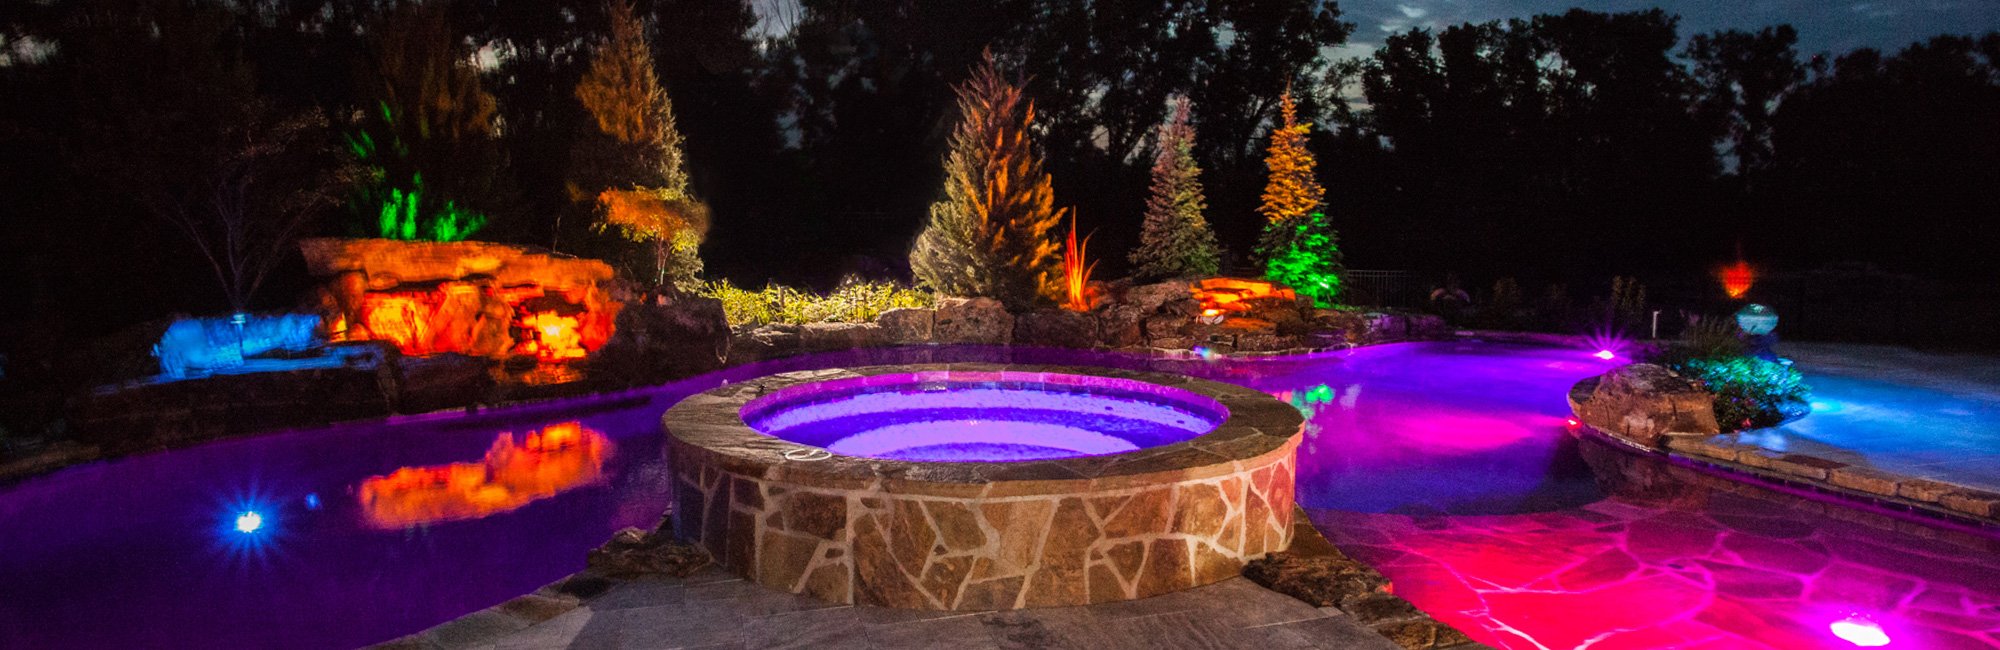 lm-custom-pools-wichita-kansas-homepage-custom-pools-image-NEW